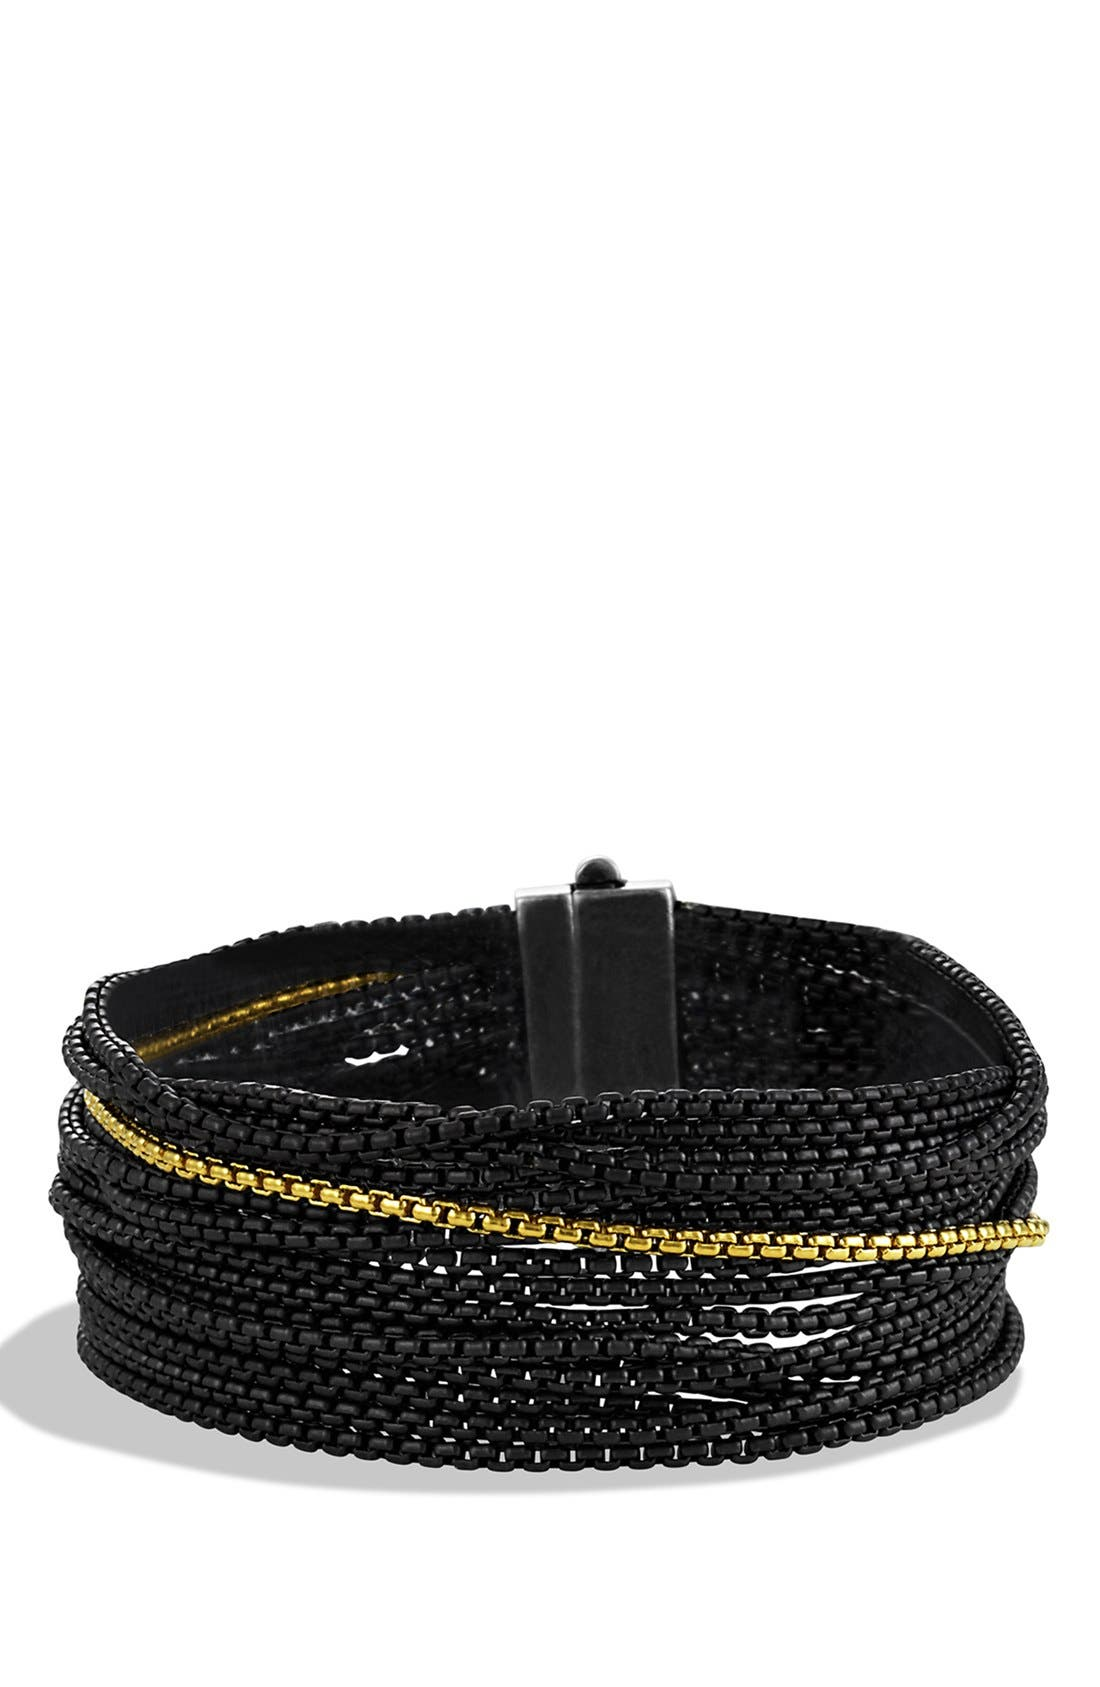 Alternate Image 1 Selected - David Yurman Sixteen-Row Chain Bracelet with Gold